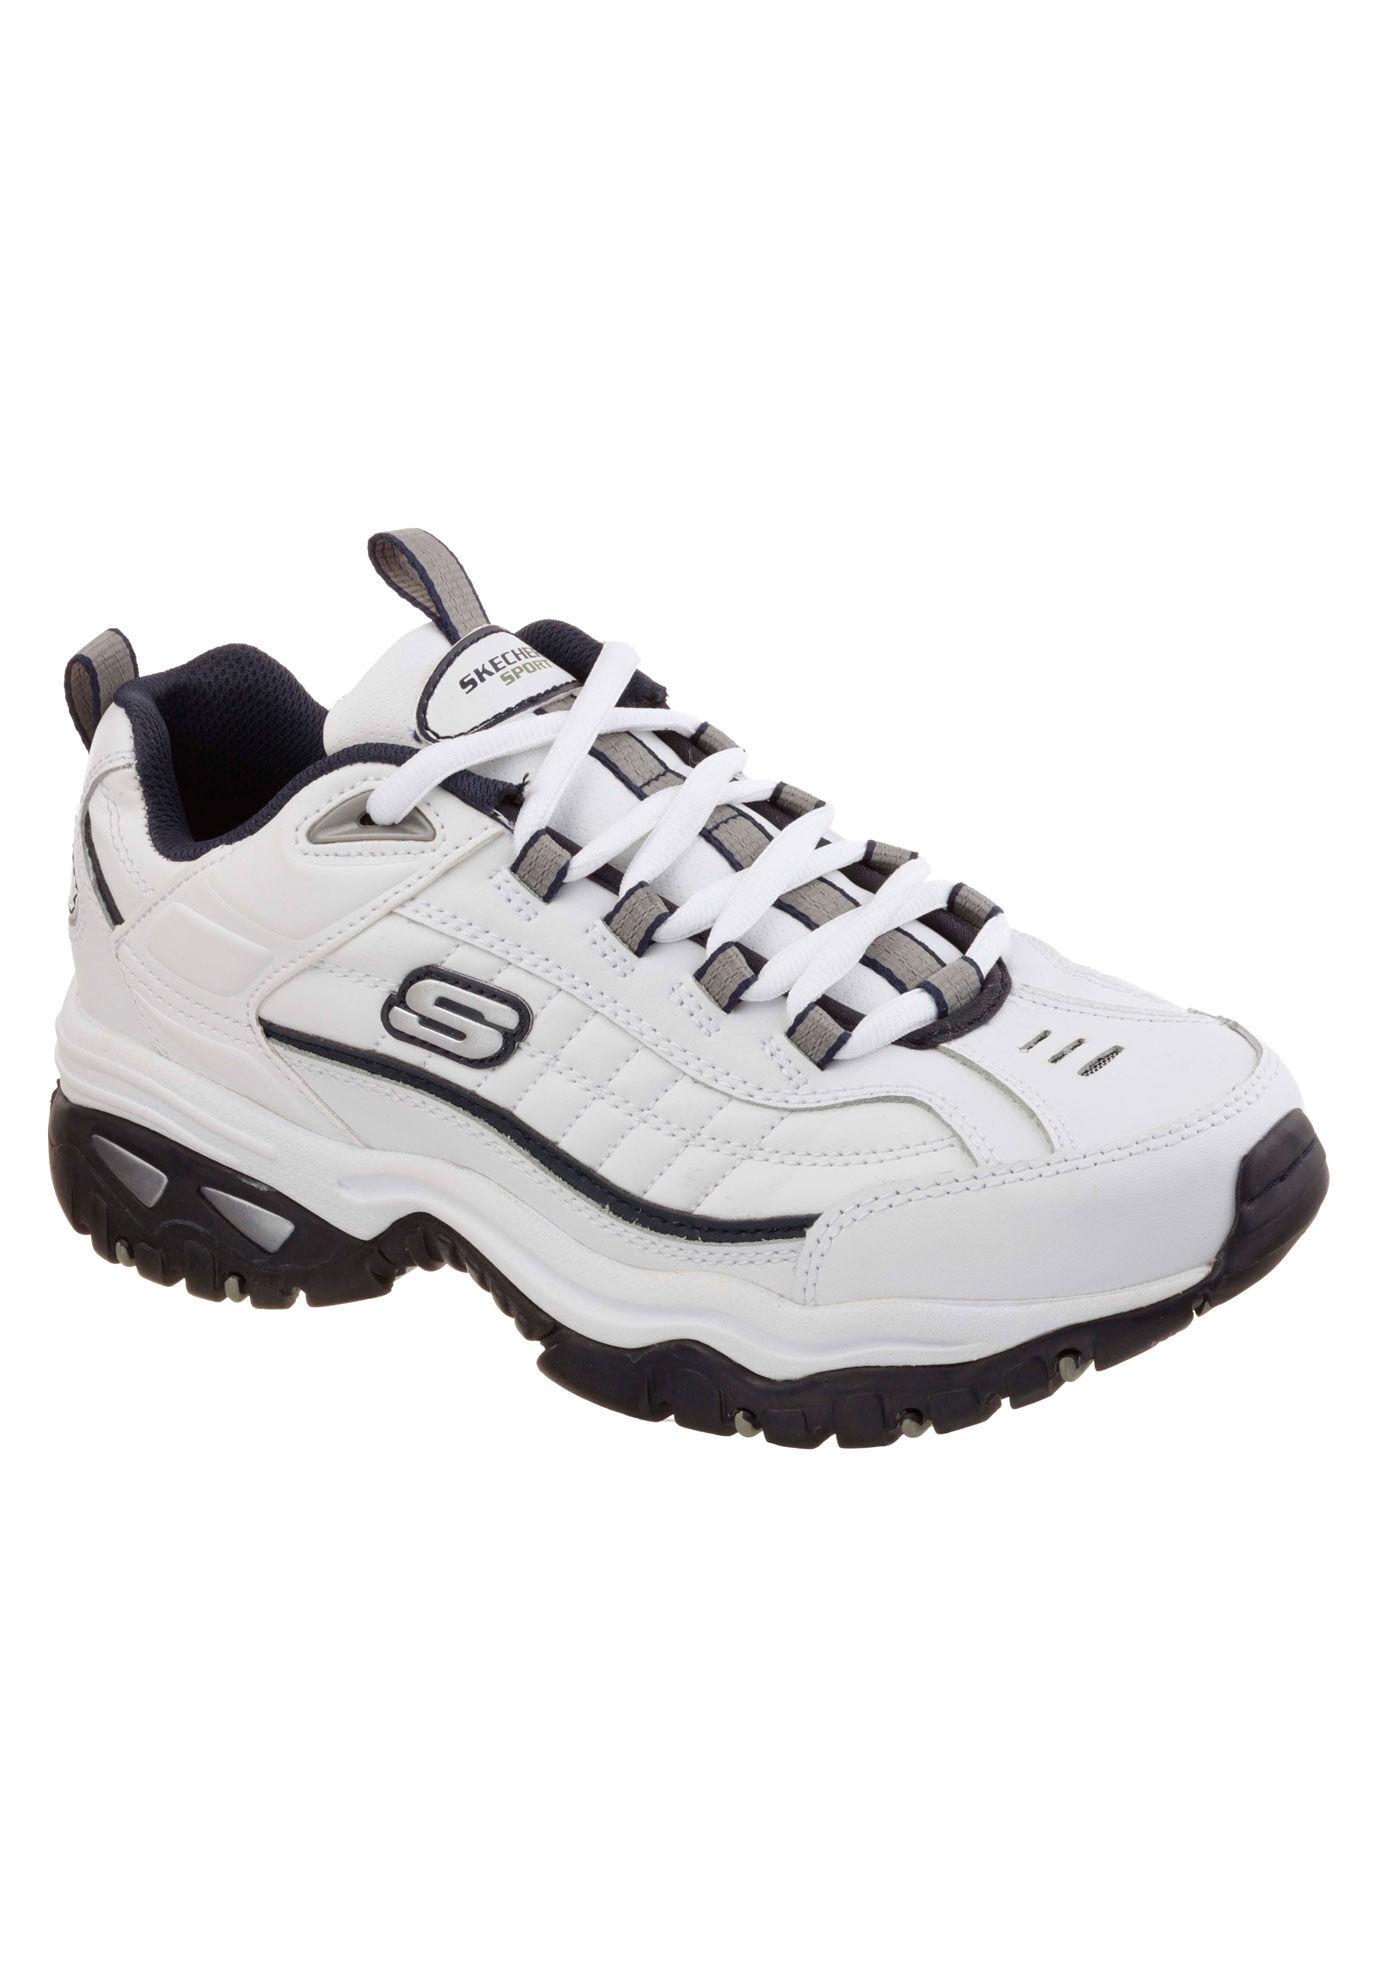 Big \u0026 Tall by Skechers Brand for Men